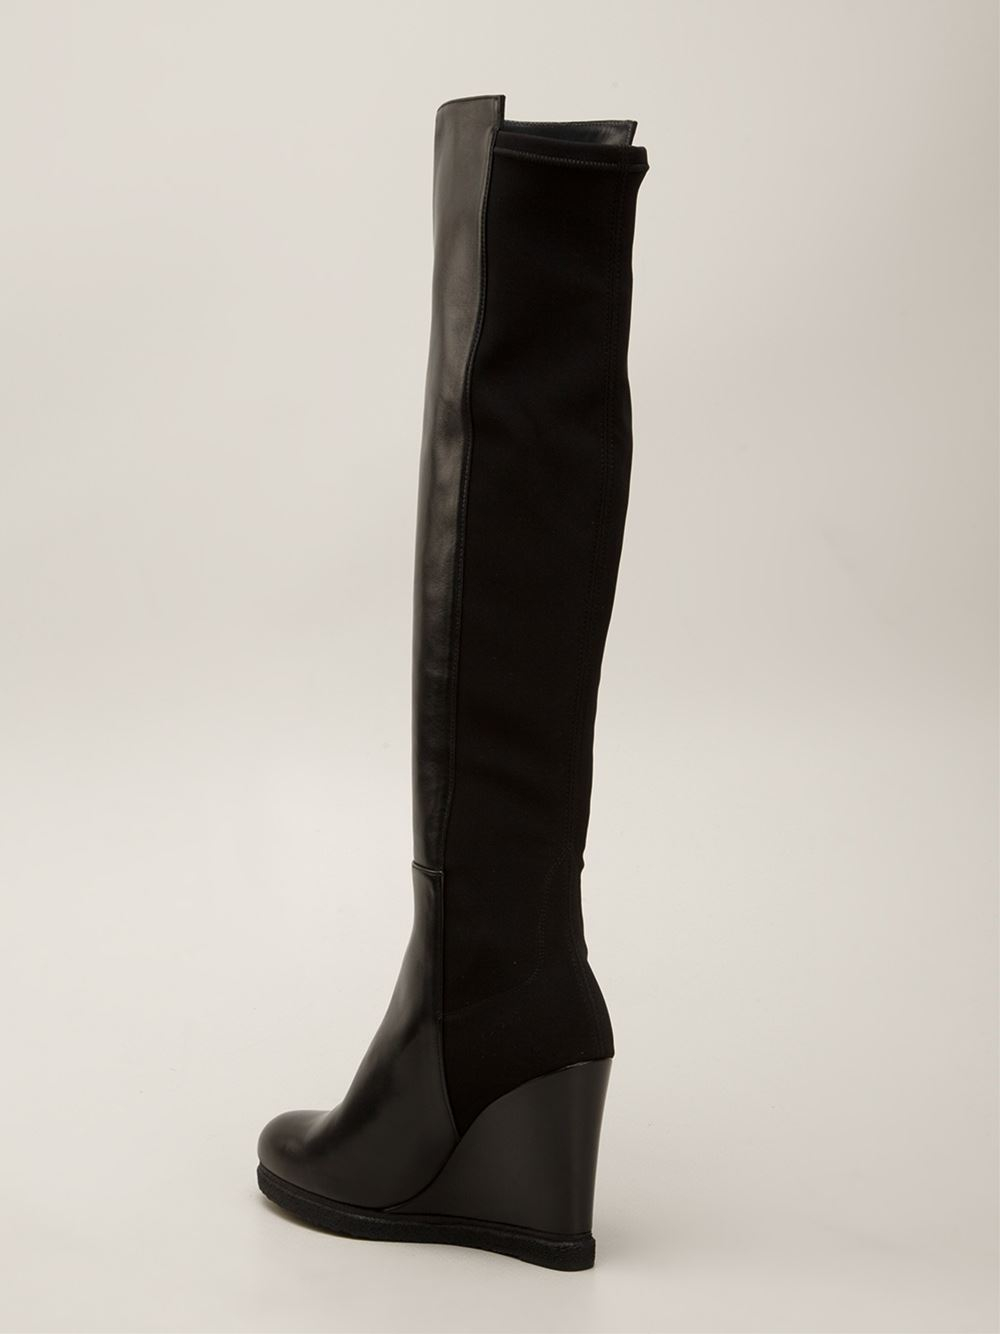 1c82ba5386f Stuart weitzman demiswoon boots in black lyst jpg 1000x1334 Stuart weitzman  demiswoon wedge boot